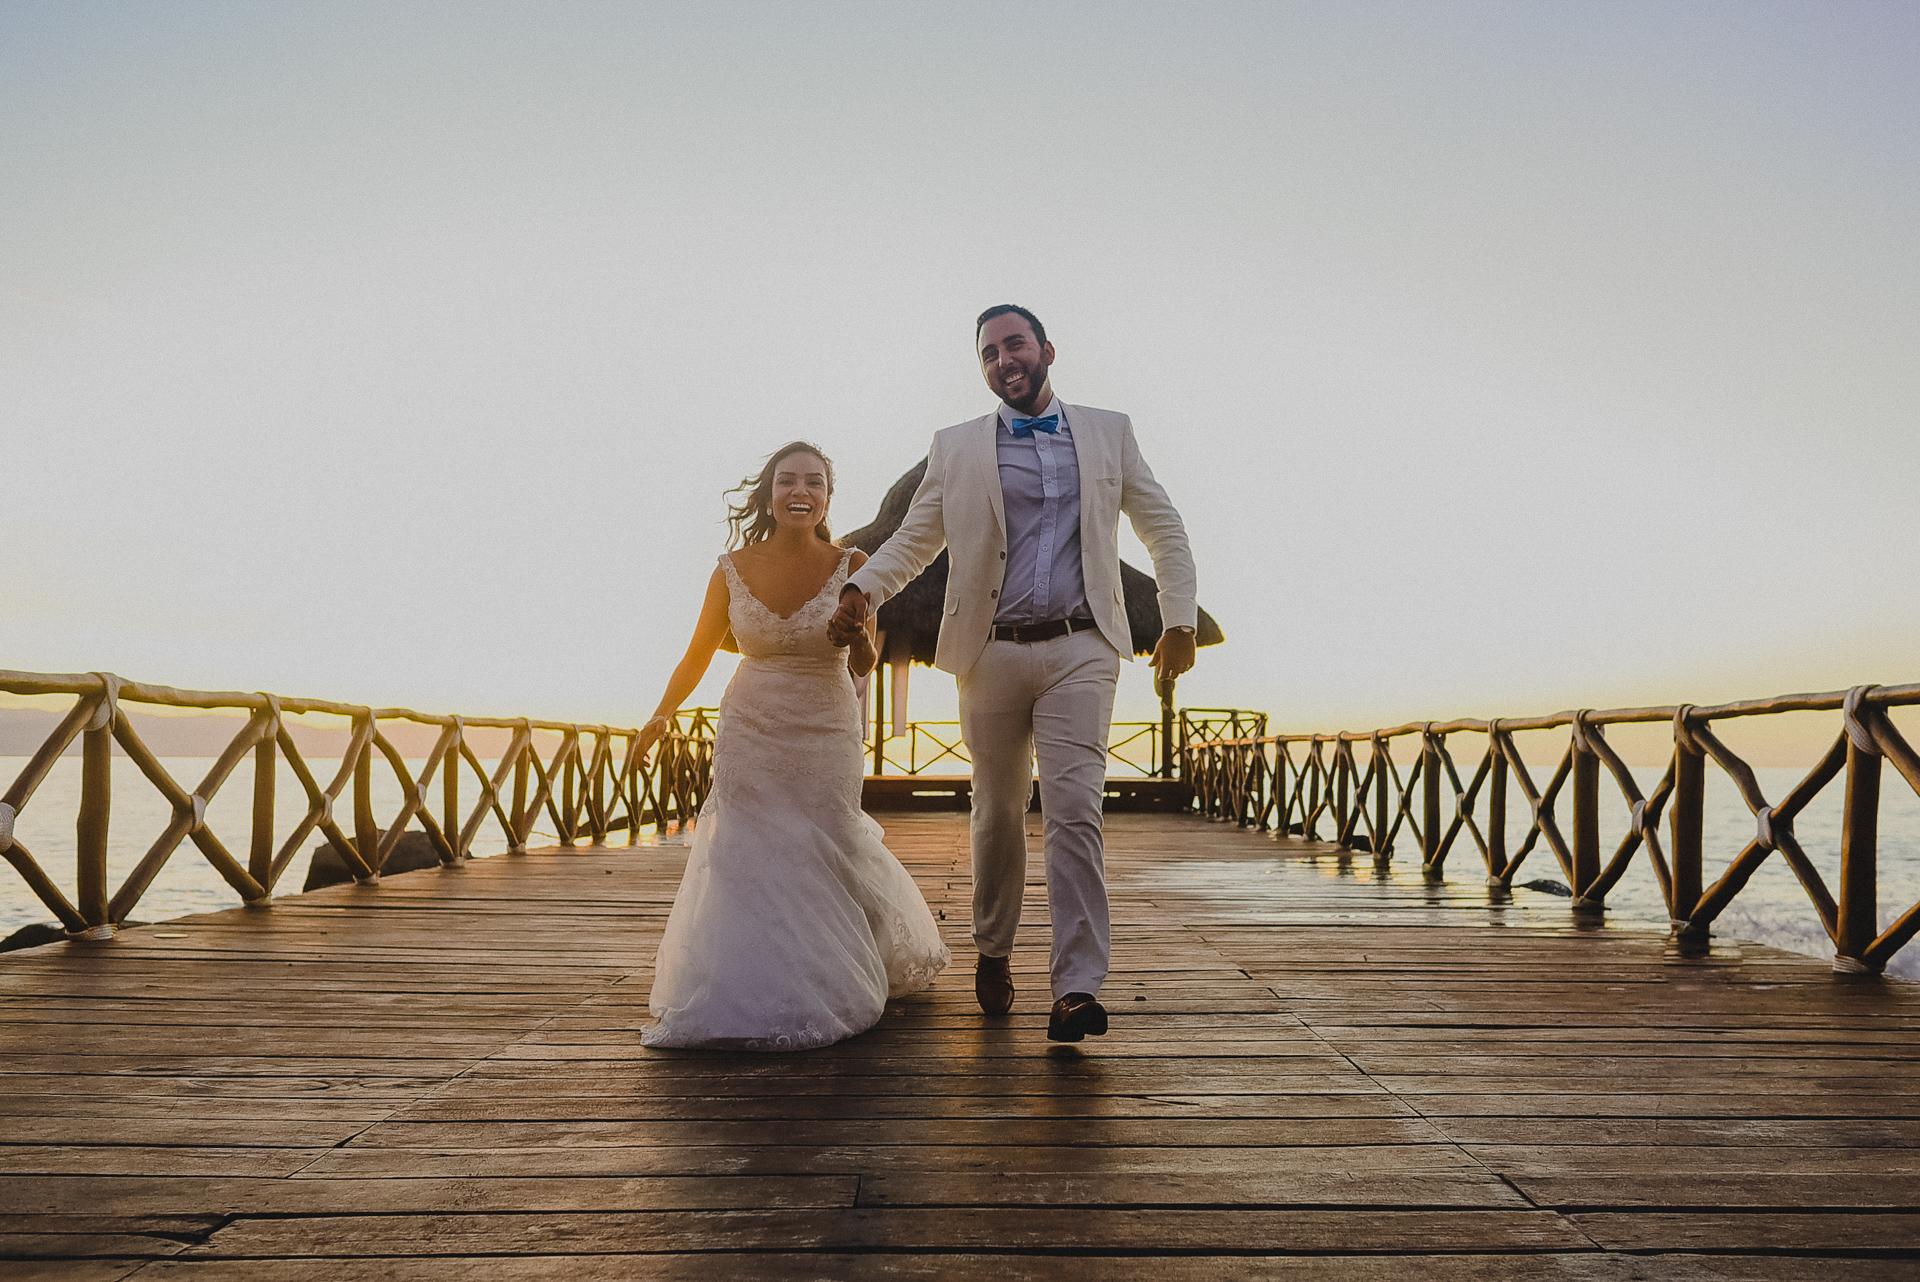 Wedding N&M BLOG luishoudin.com (85 de 174)